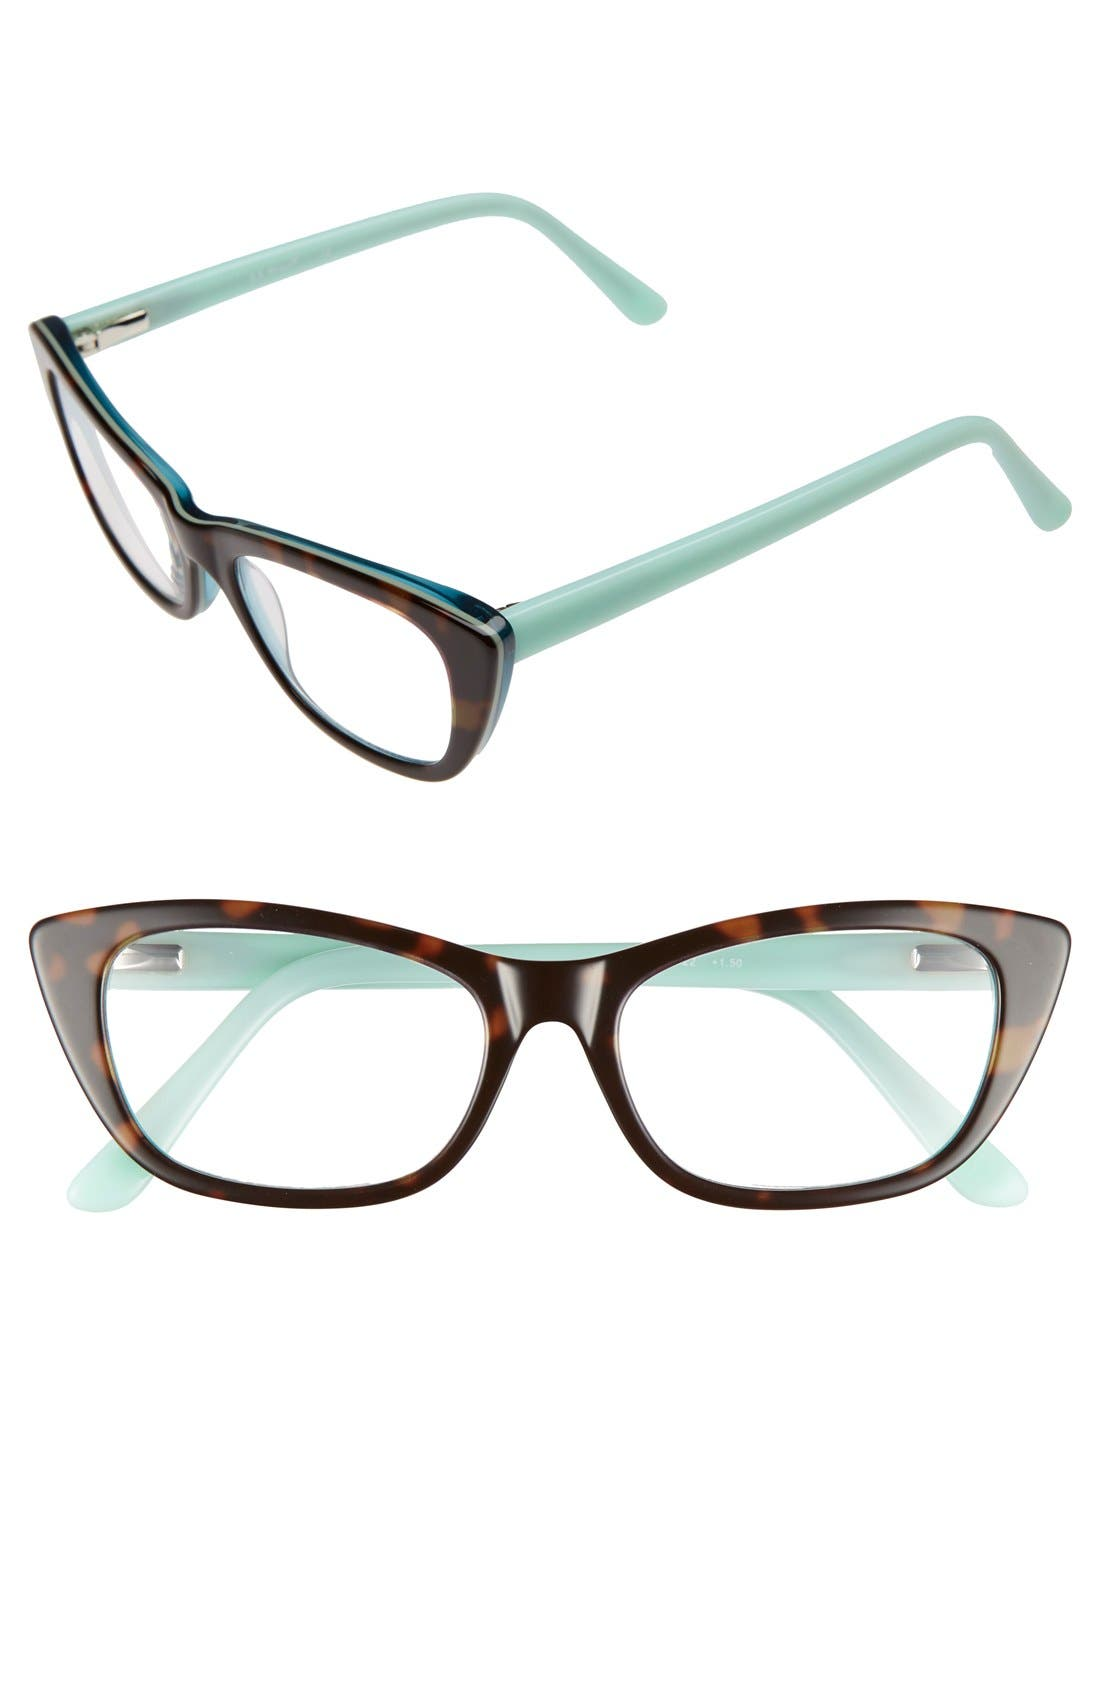 Main Image - A.J. Morgan 50mm Reading Glasses